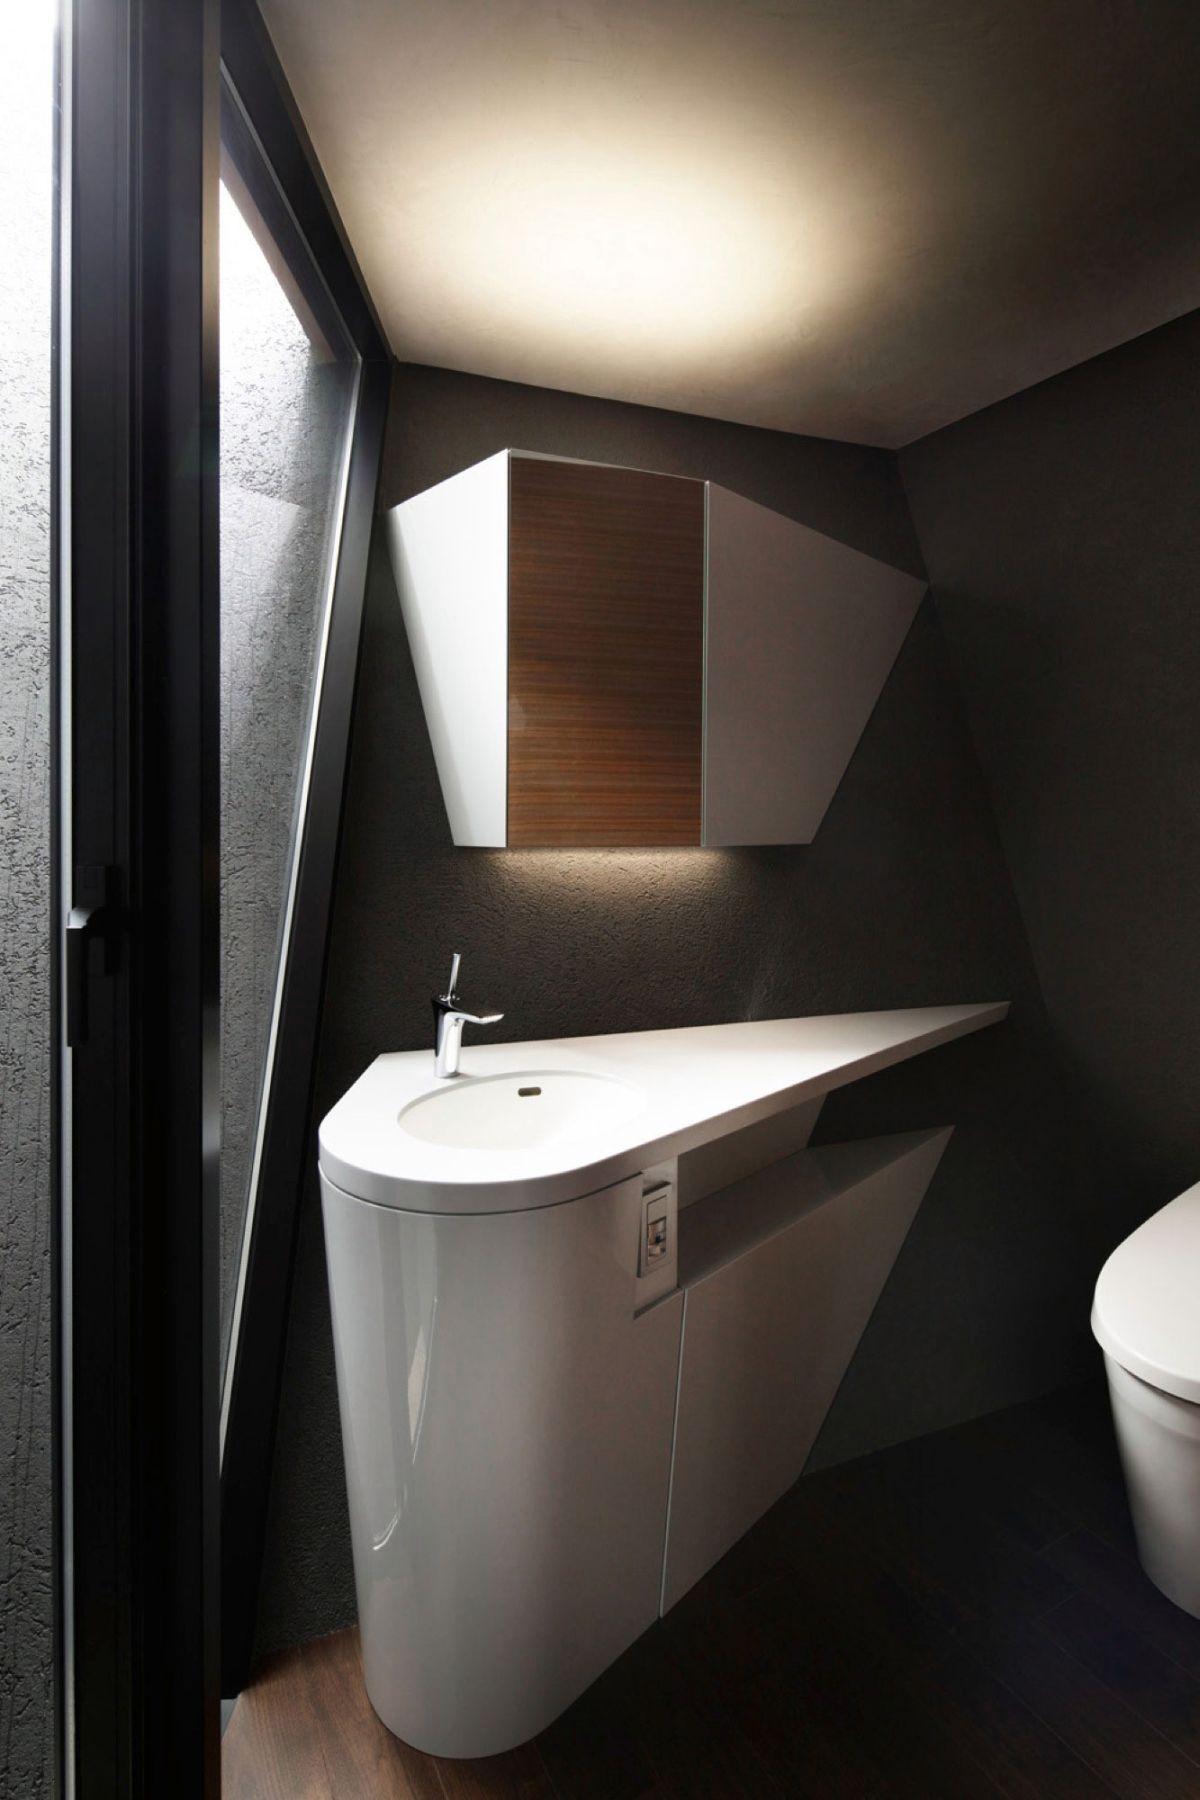 The SRK residence in Tokyo features sculptural bathroom vanities